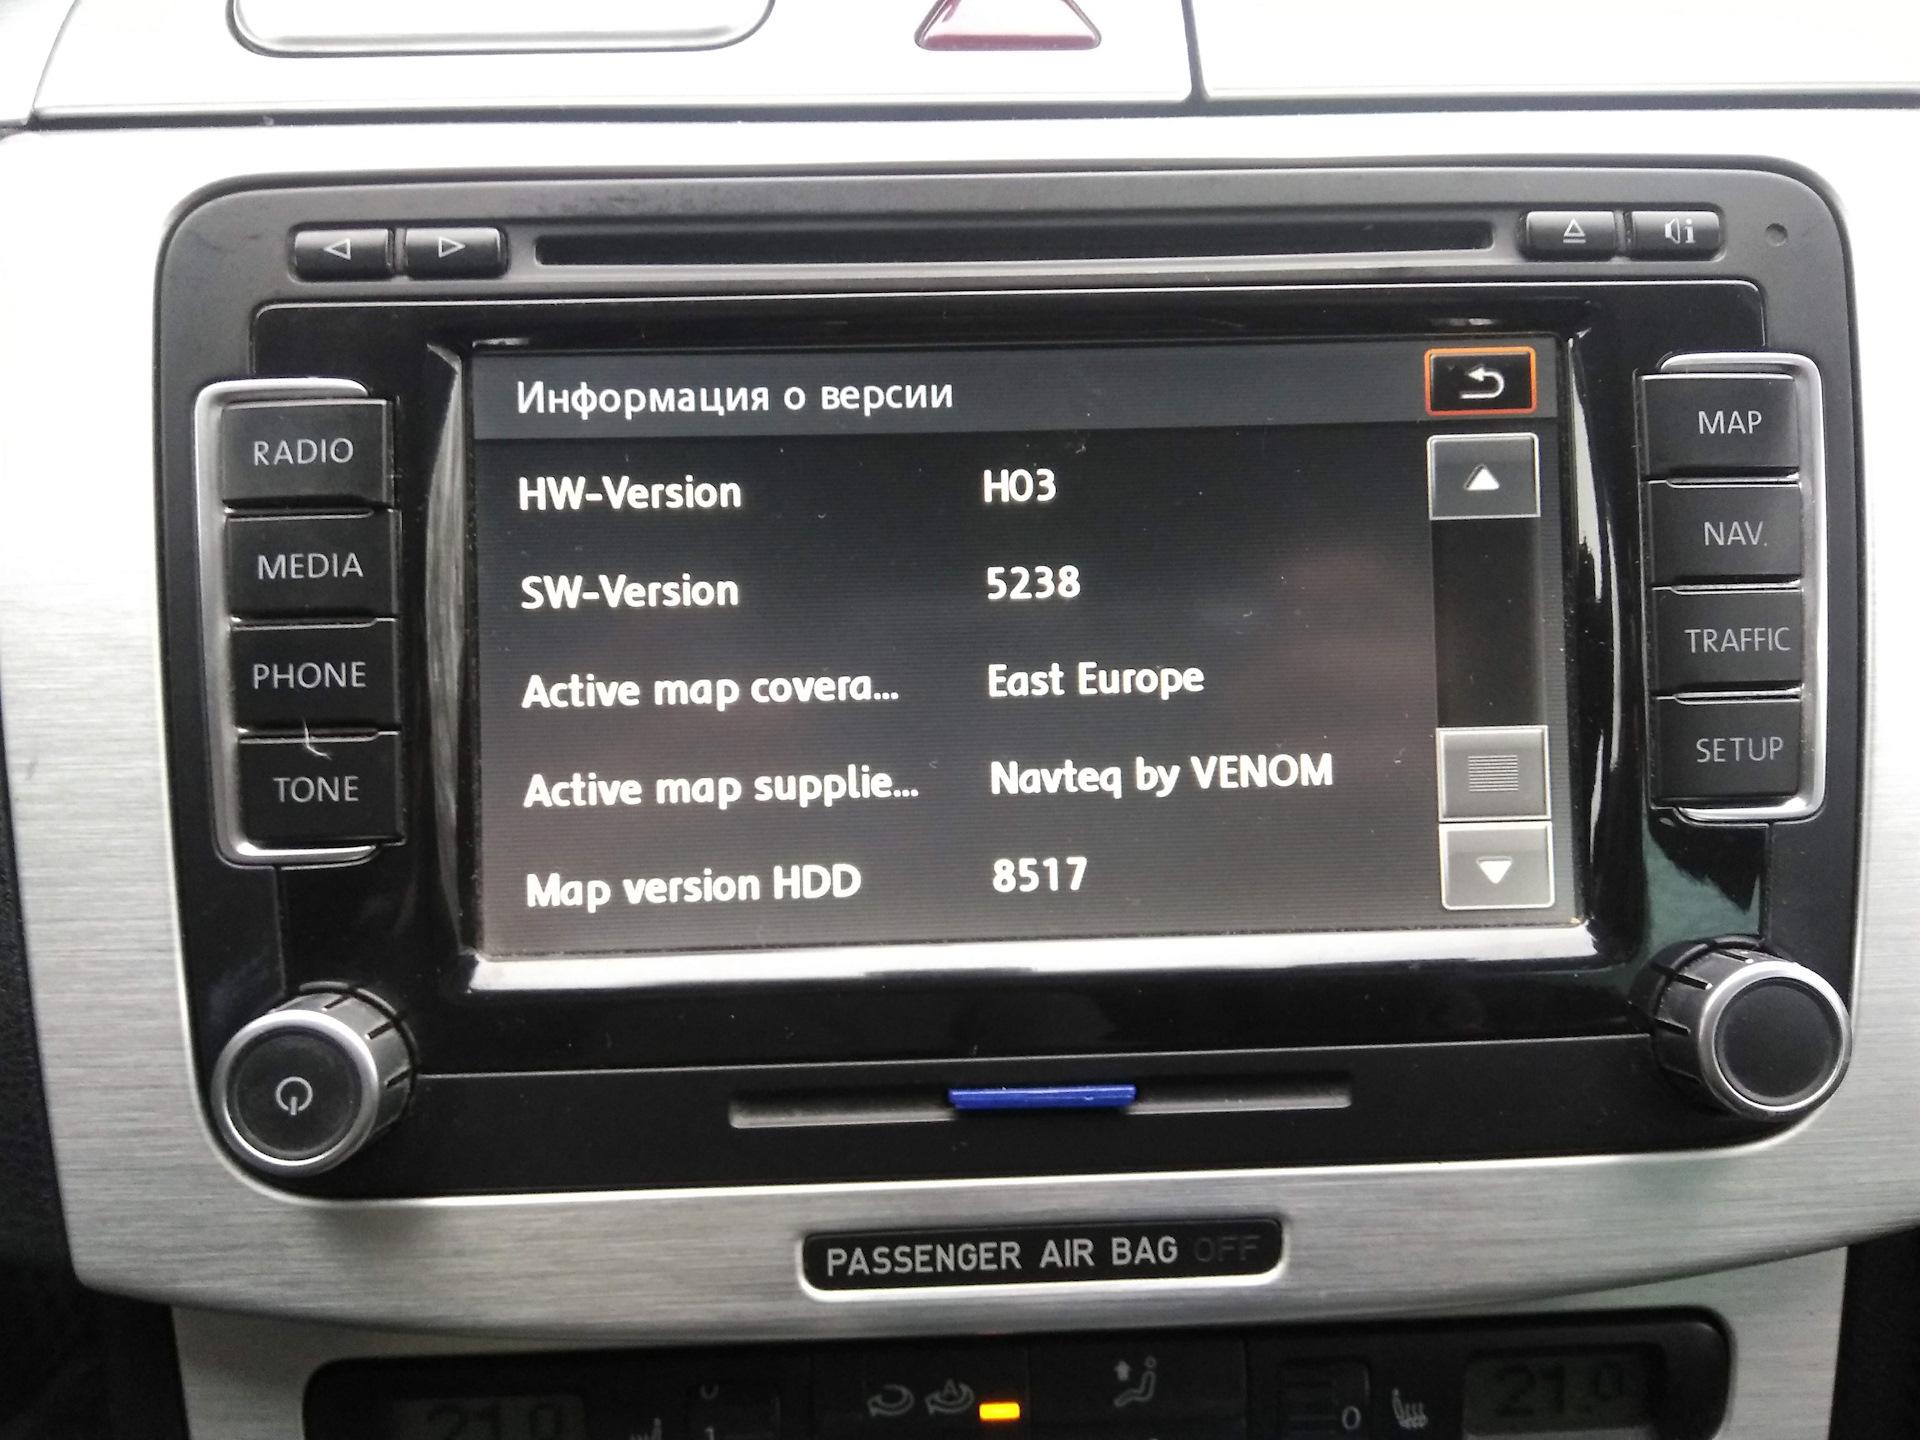 43  Upgrade maps RNS510 CD_8542 v 16 East Europe (Восточная Европа